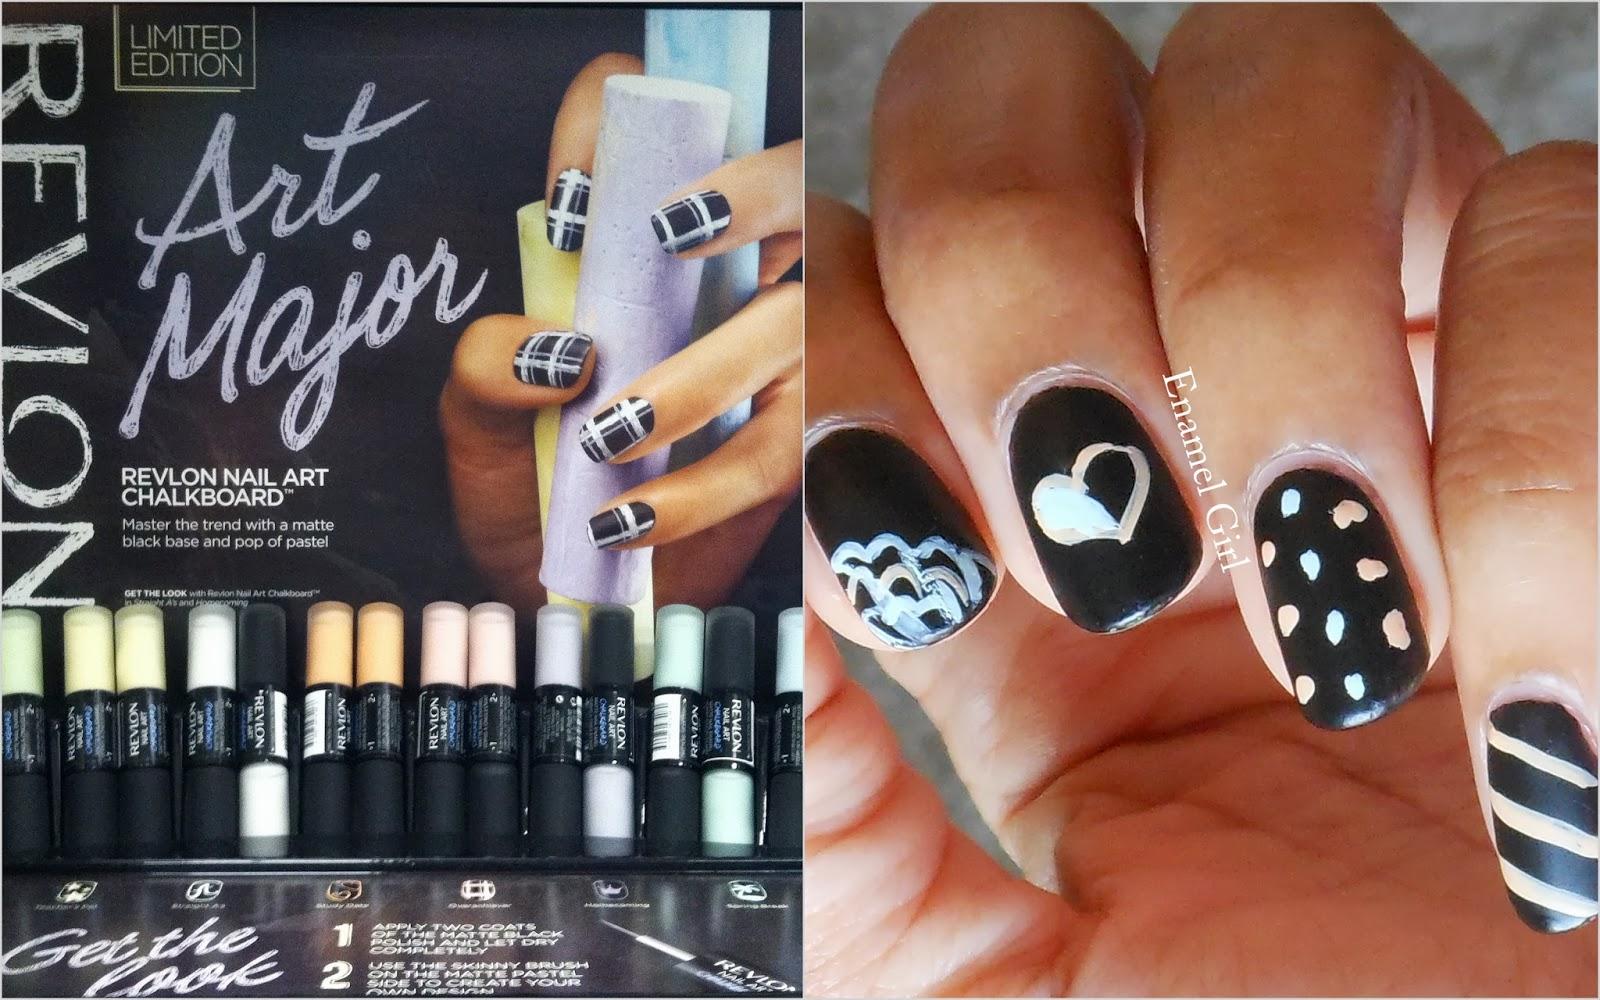 Enamel Girl Revlon Nail Art Chalkboard Polish Review And Swatches